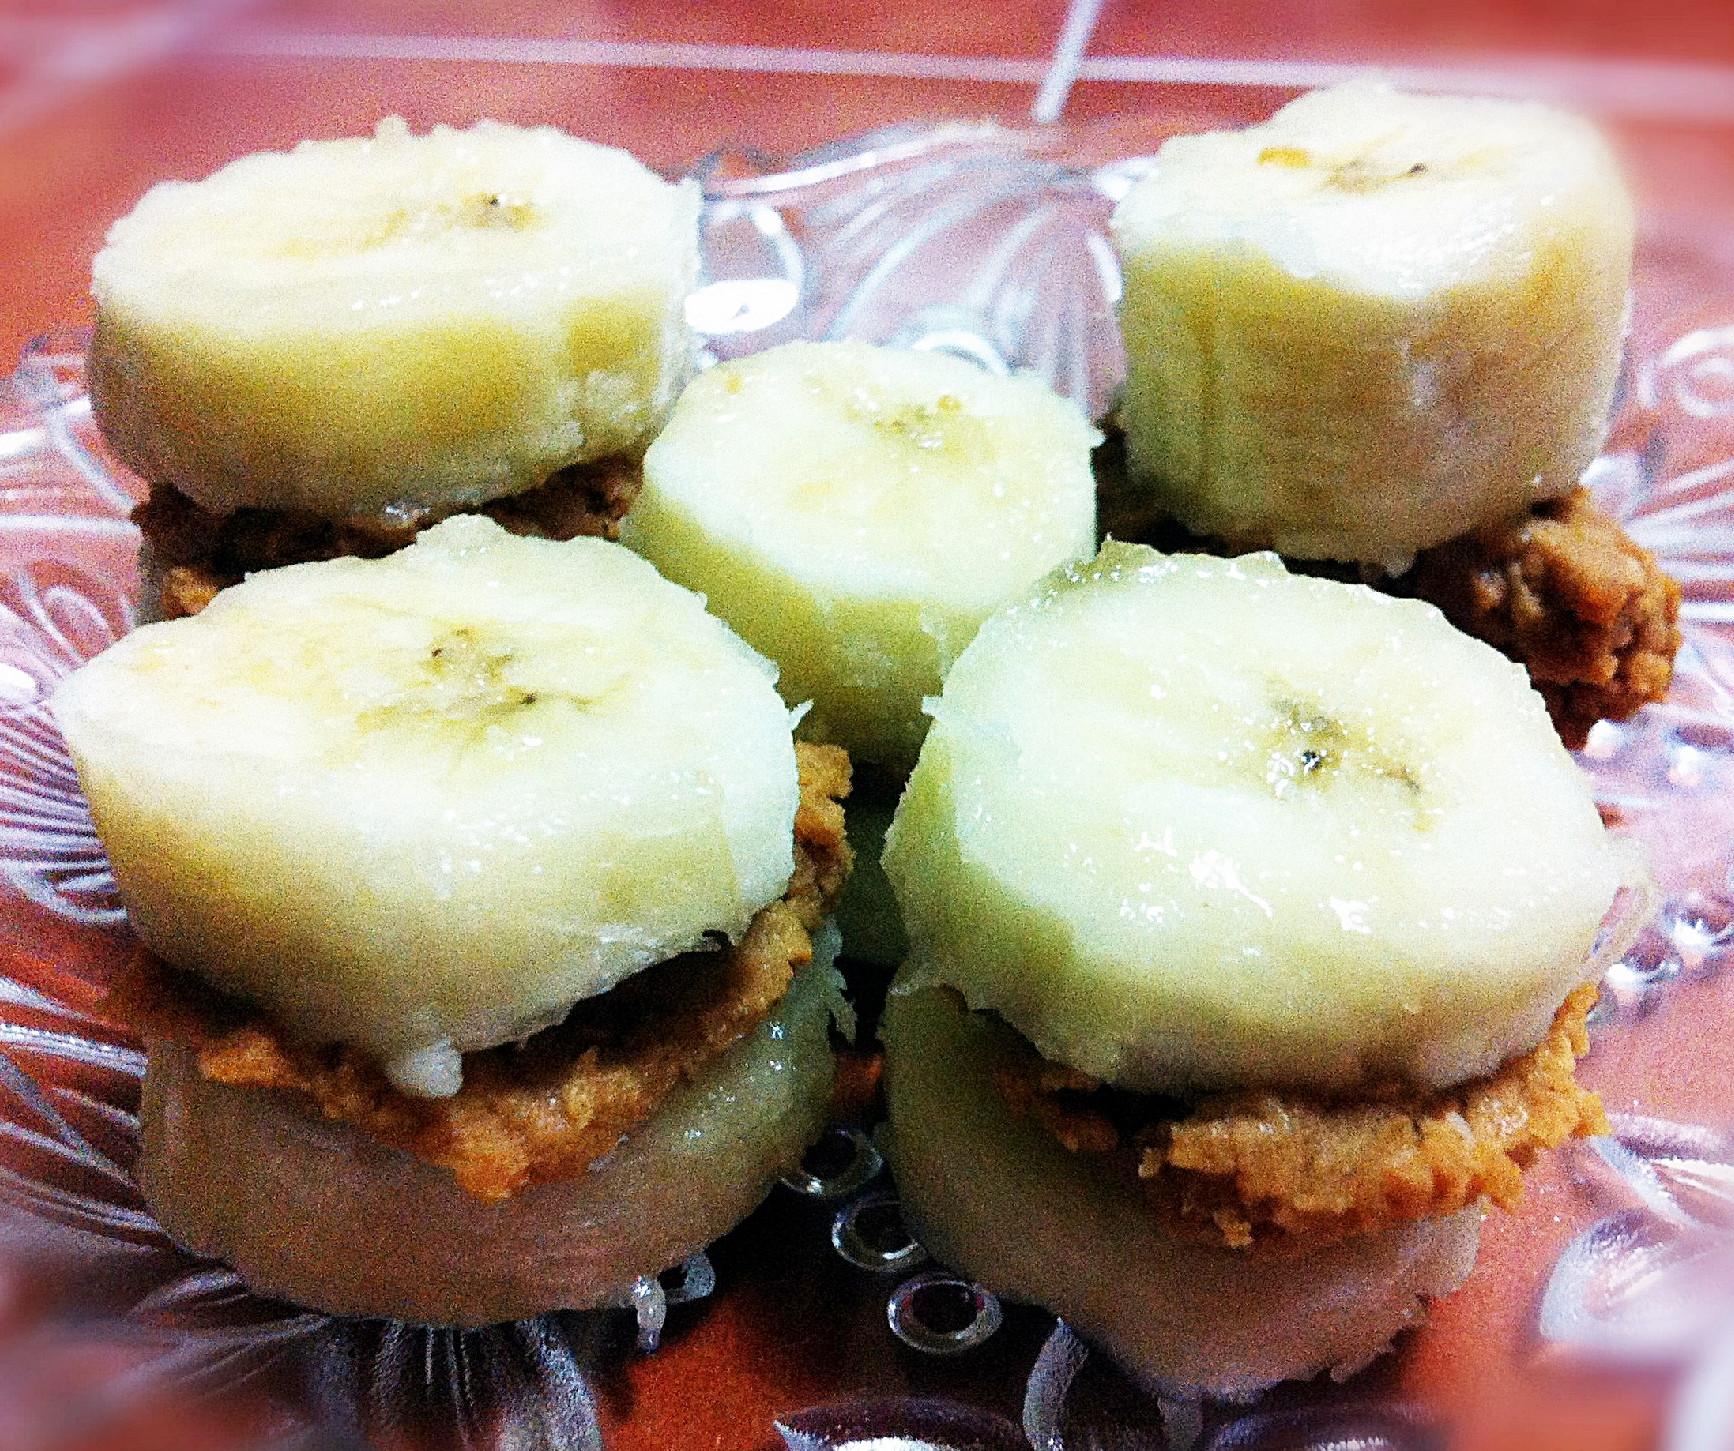 Healthy Dessert Ideas Easy  Healthy Dessert Ideas Banana and Peanut Butter Bites